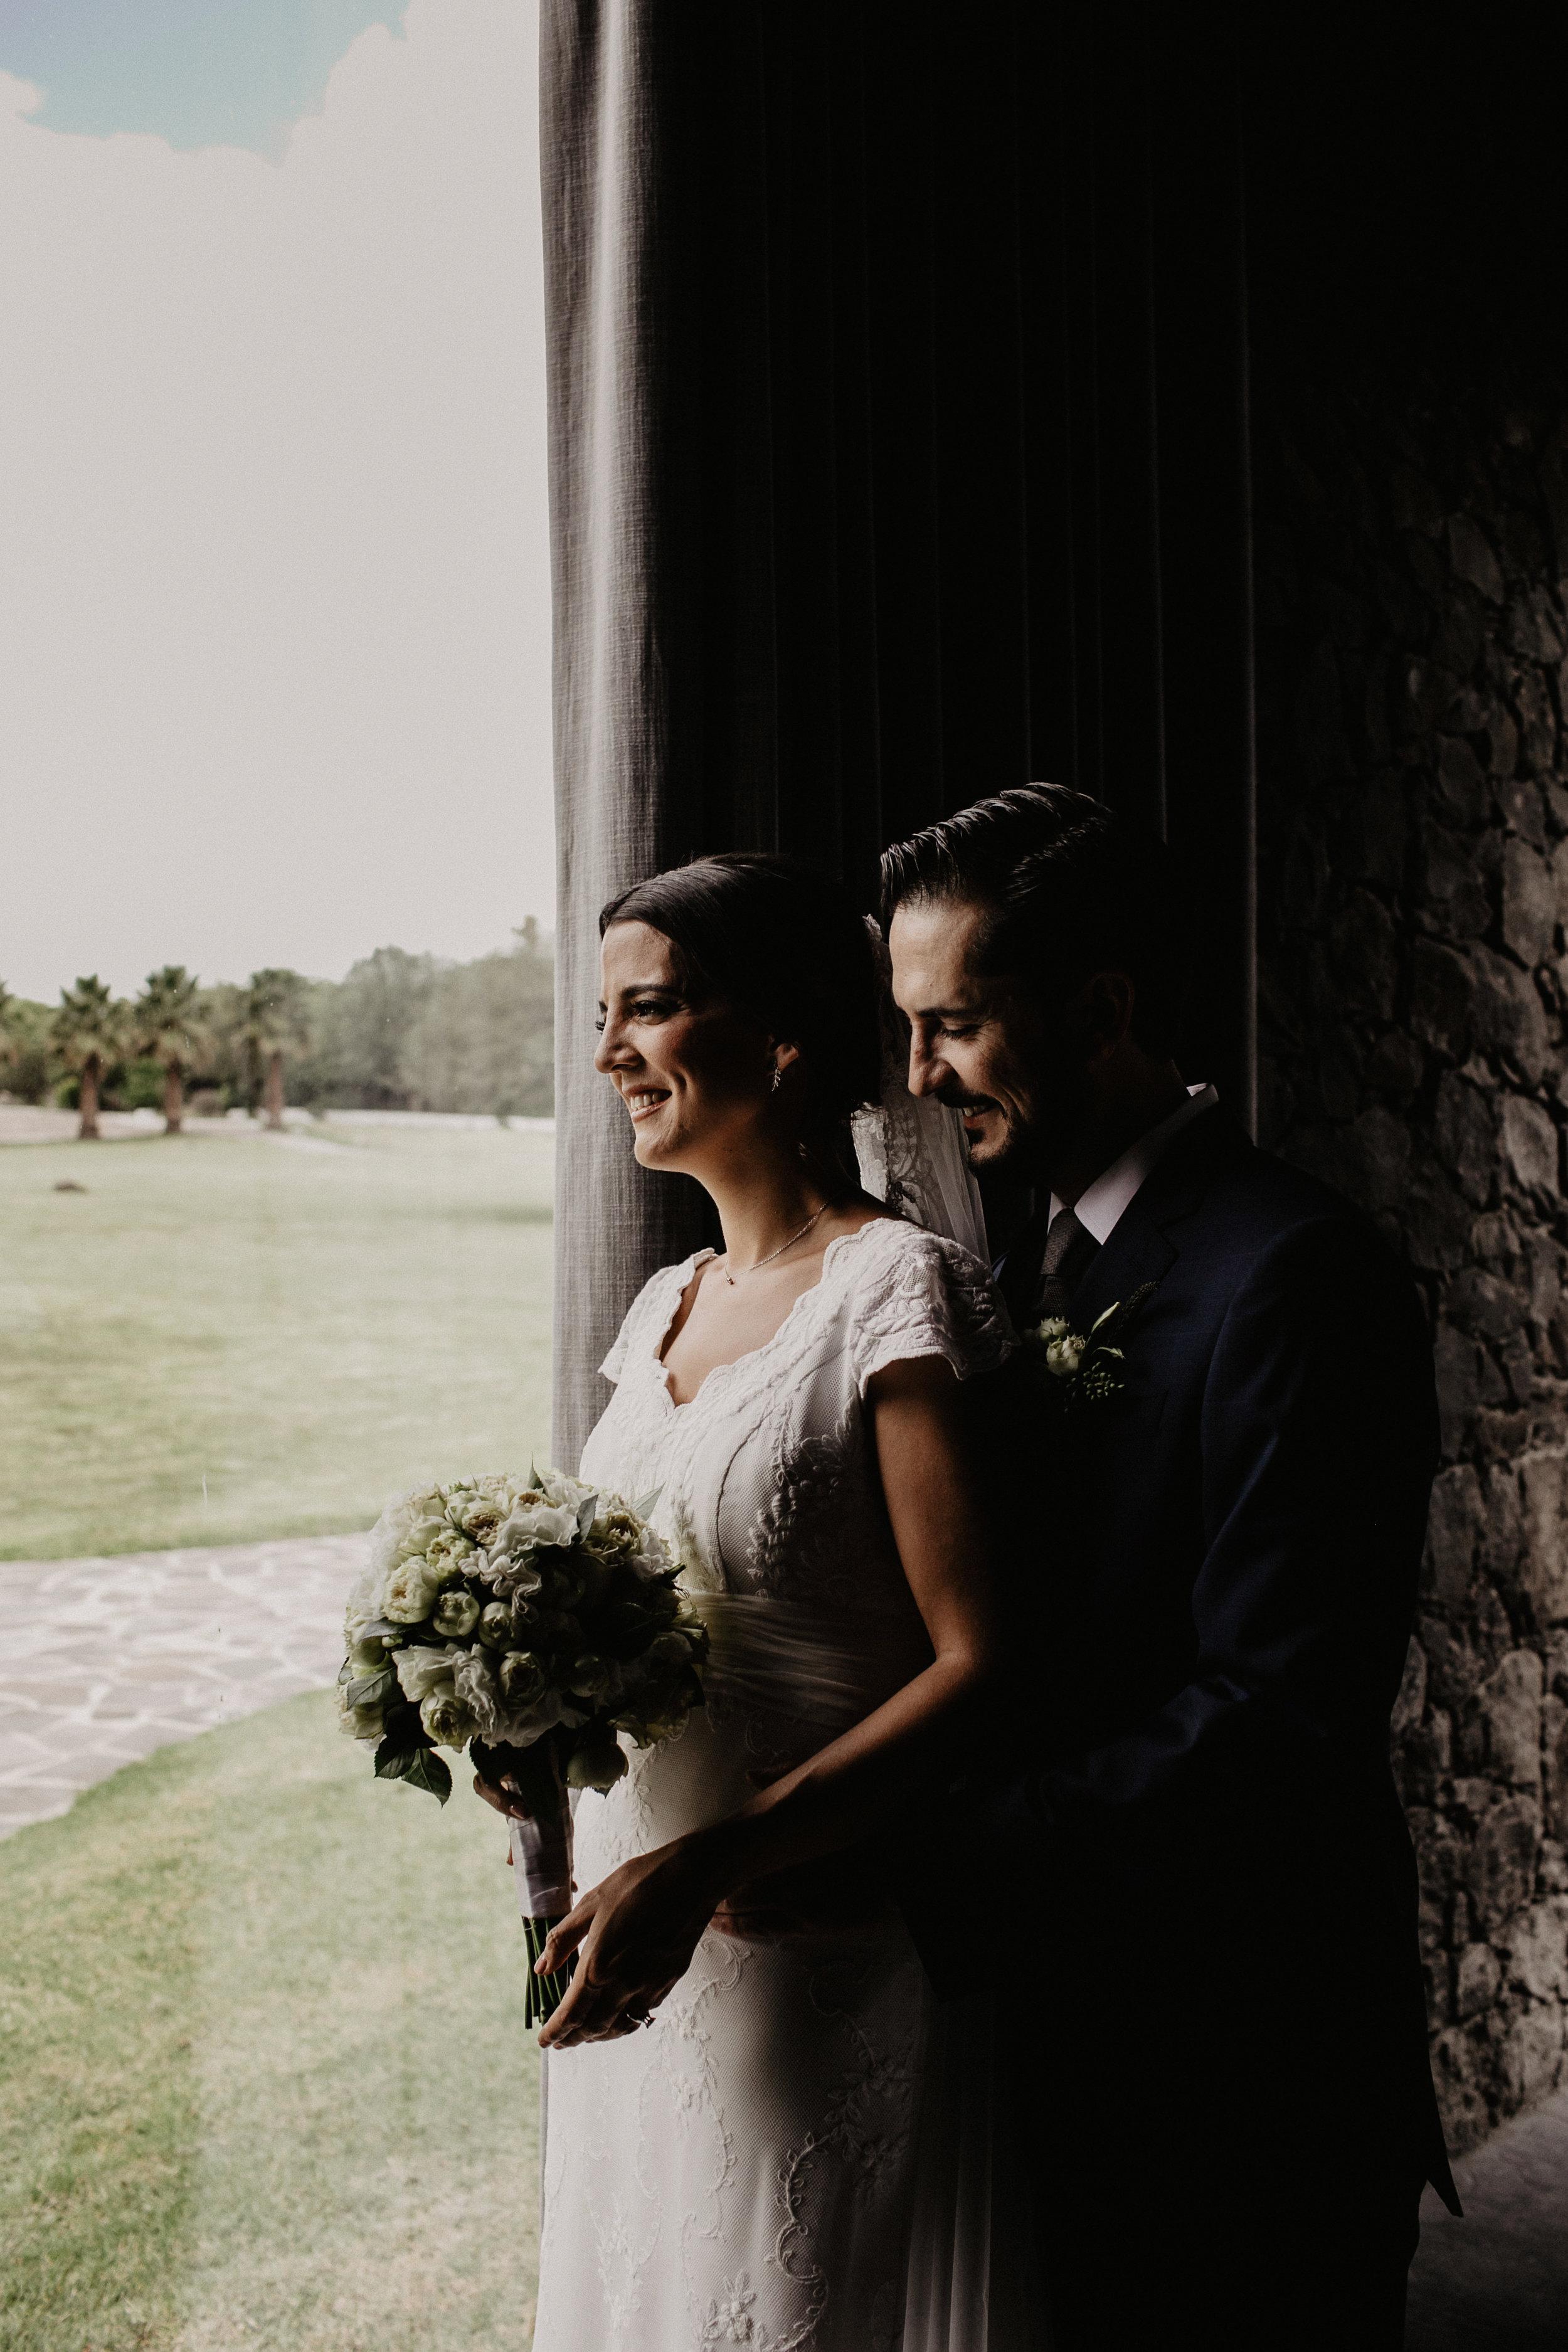 alfonso_flores_destination_wedding_photographer_pau_alonso_275.JPG